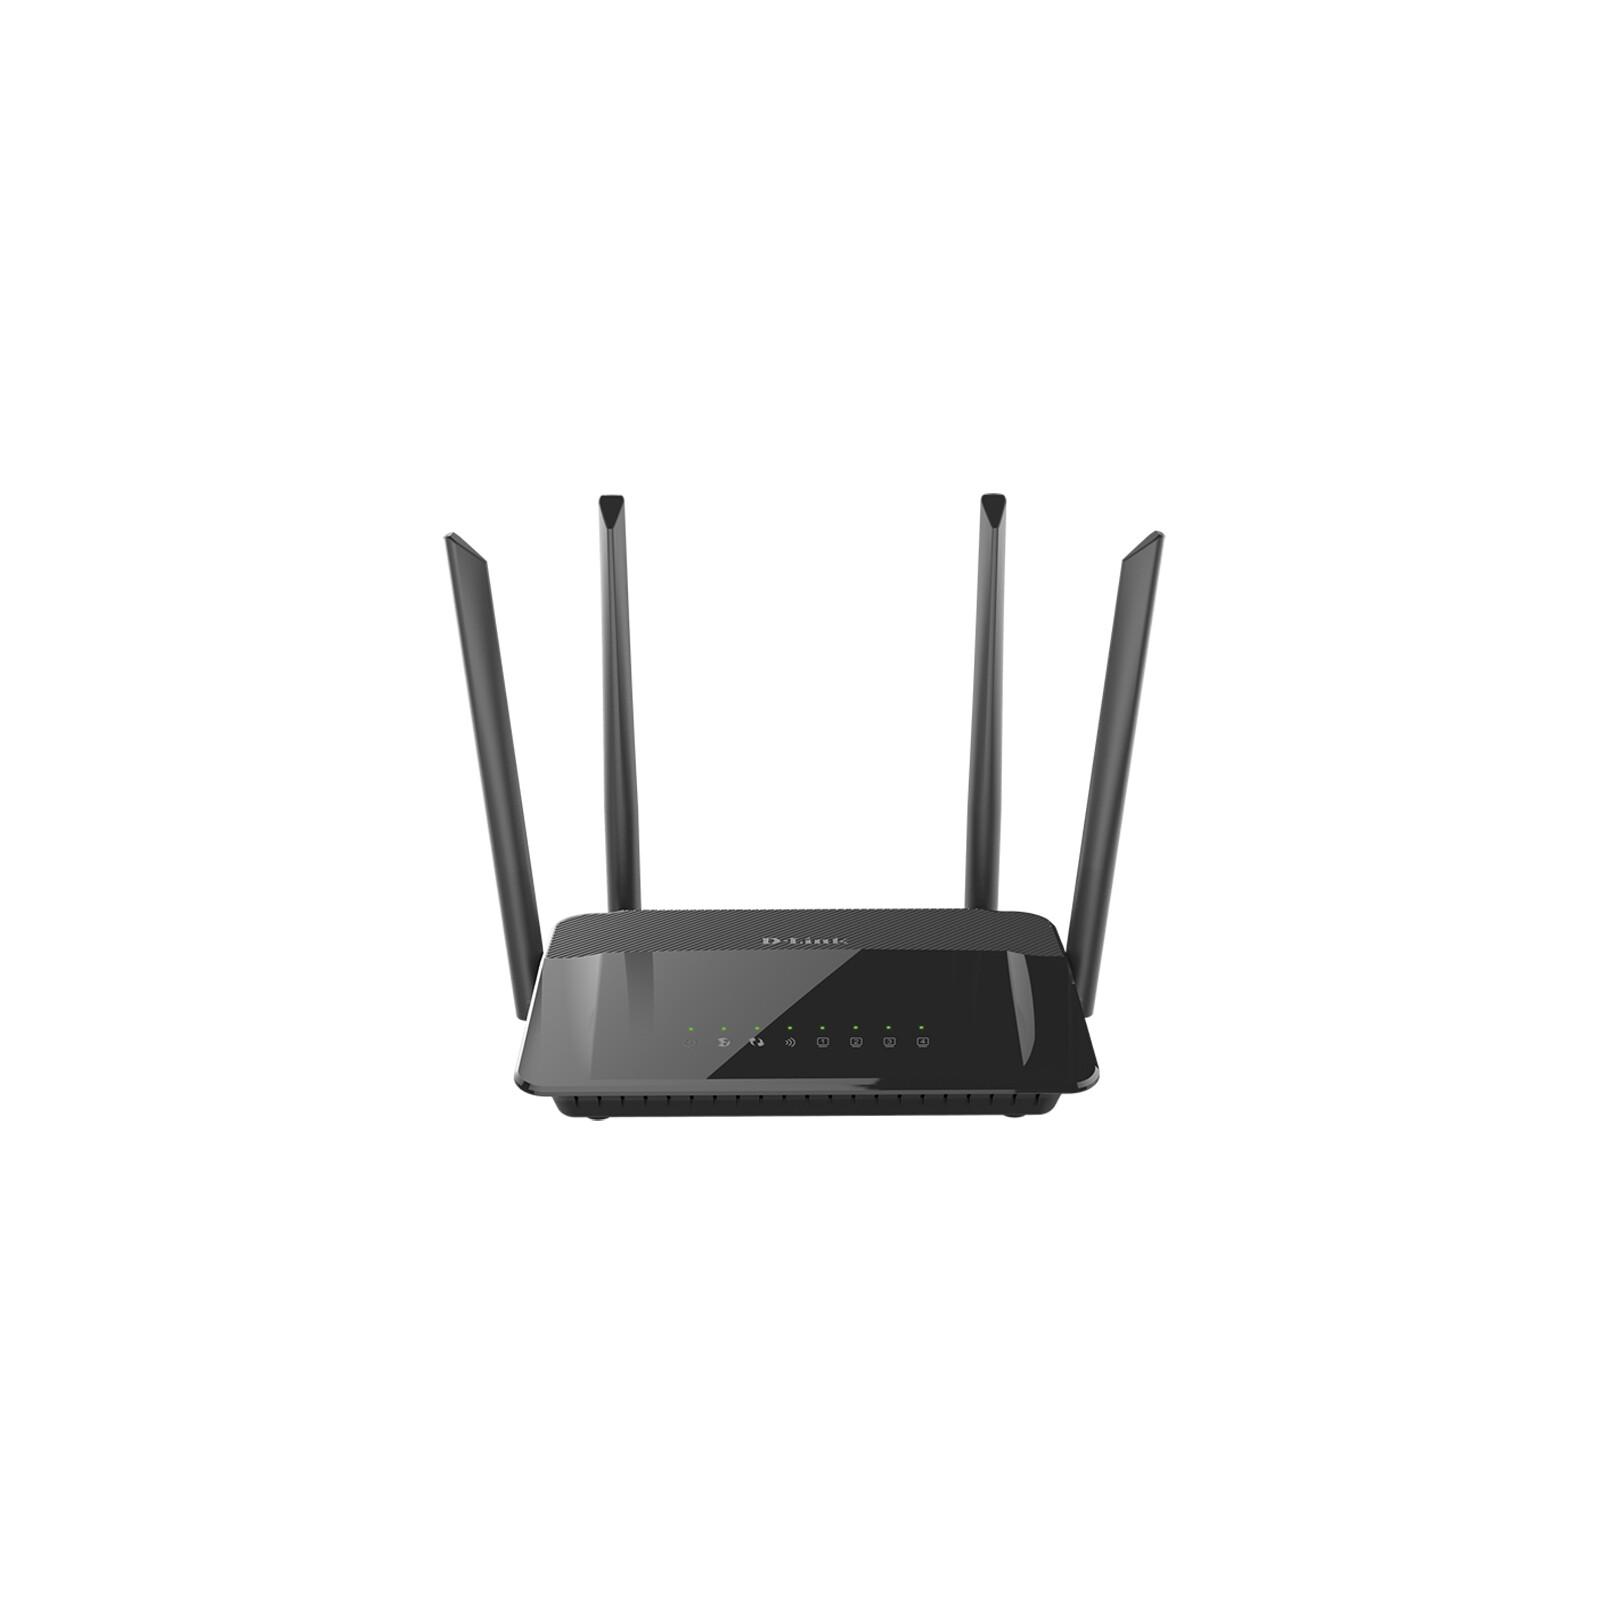 D-Link Dualband Gigabit Router AC1200